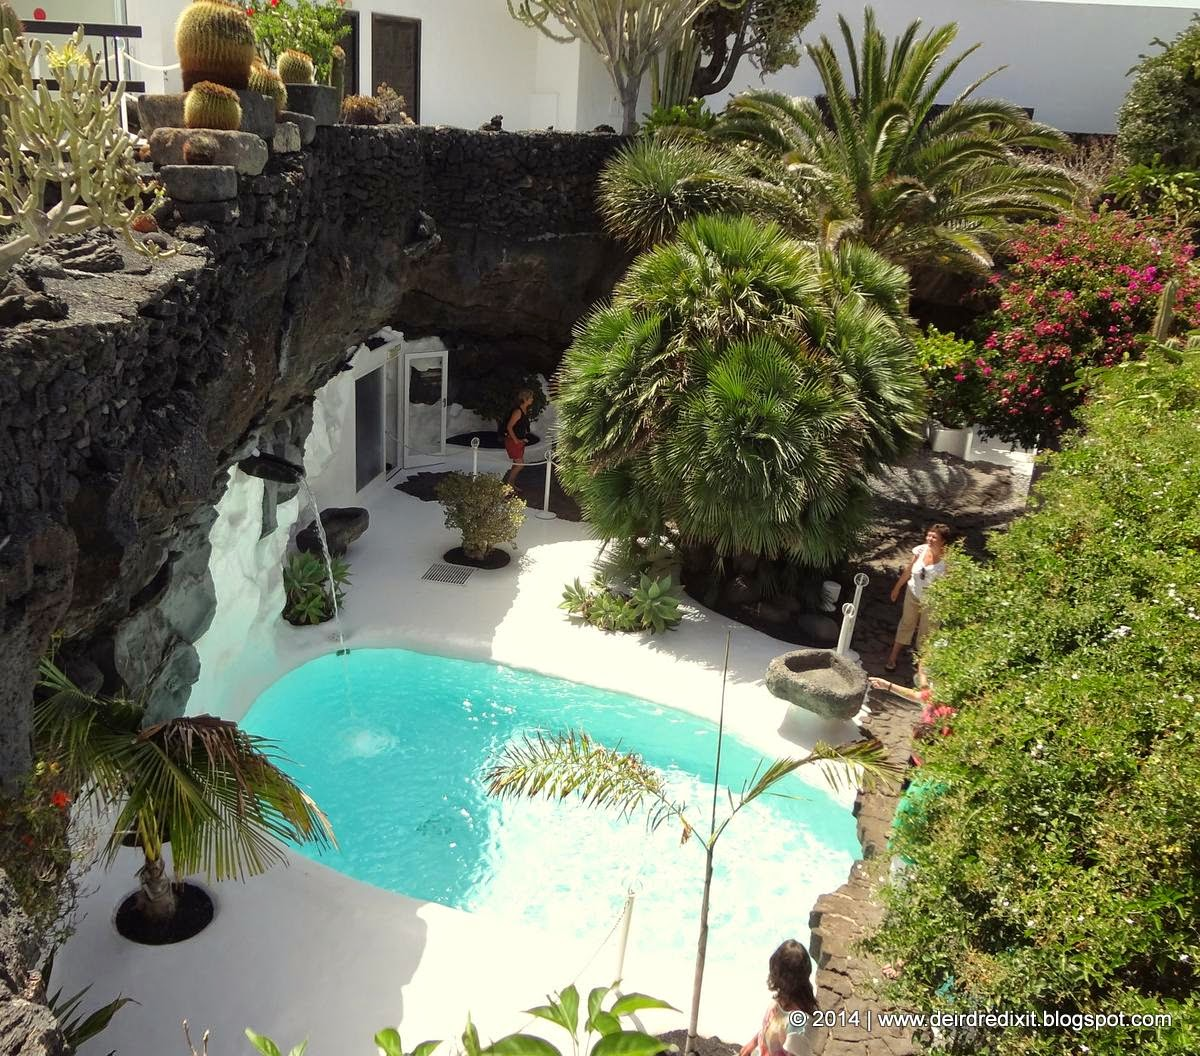 Lanzarote, Casa di César Manrique